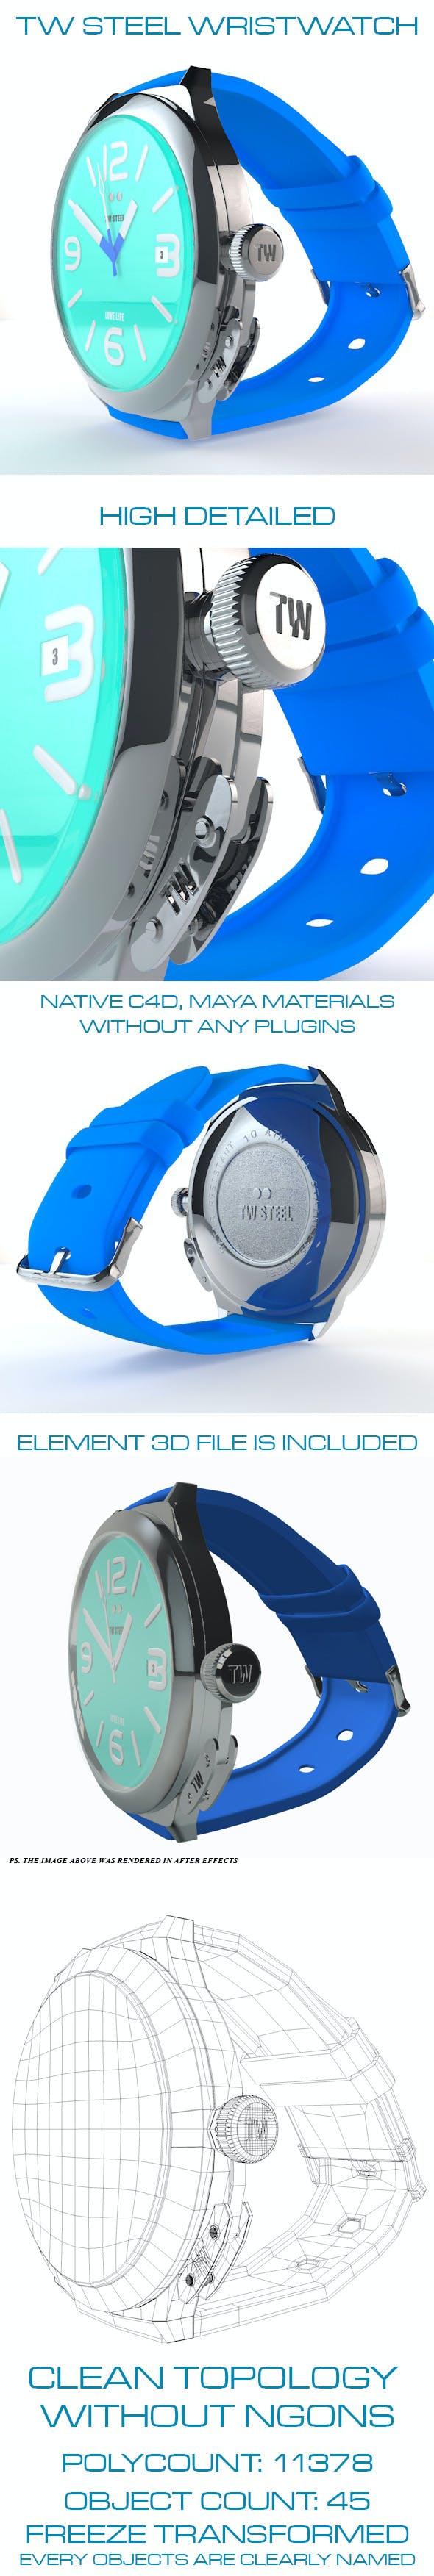 TW Steel Wristwatch TW915 - 3DOcean Item for Sale